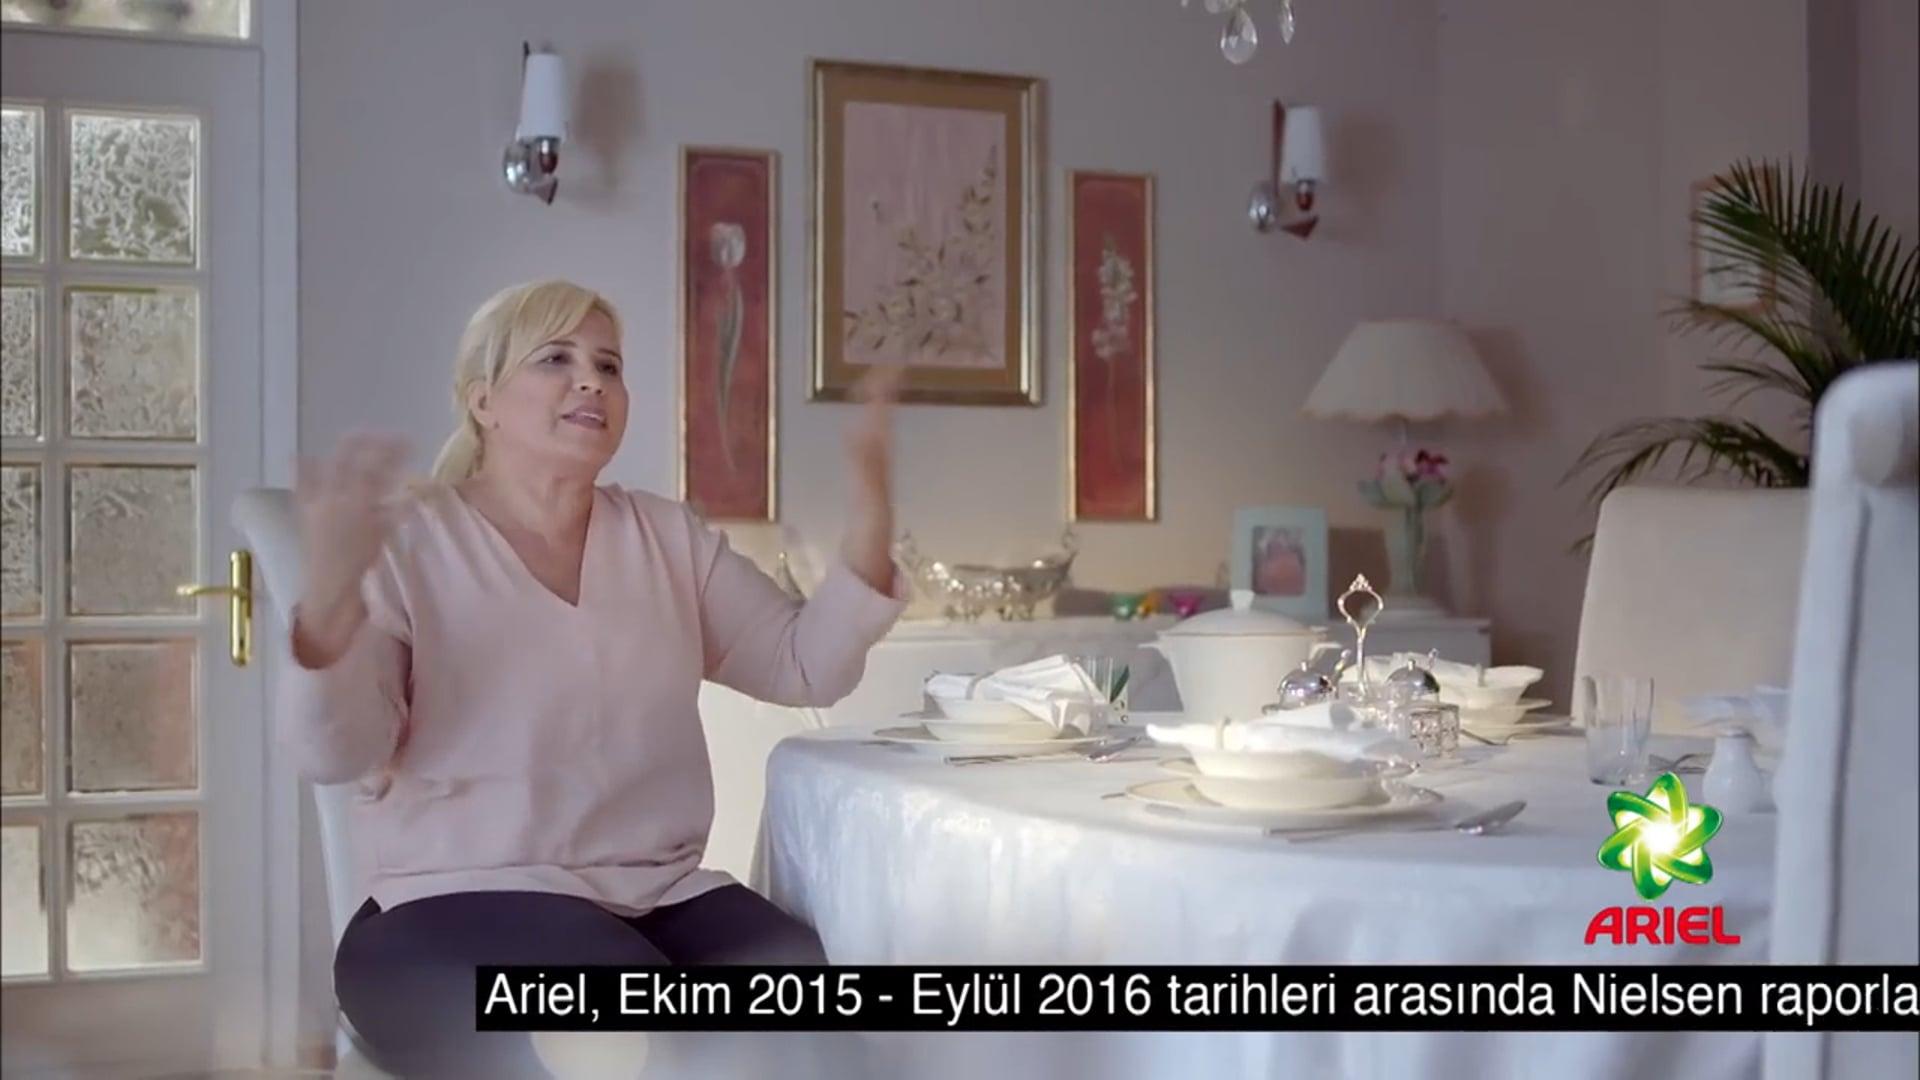 Murat Senoy - P&G Ariel Testimonial - Adana